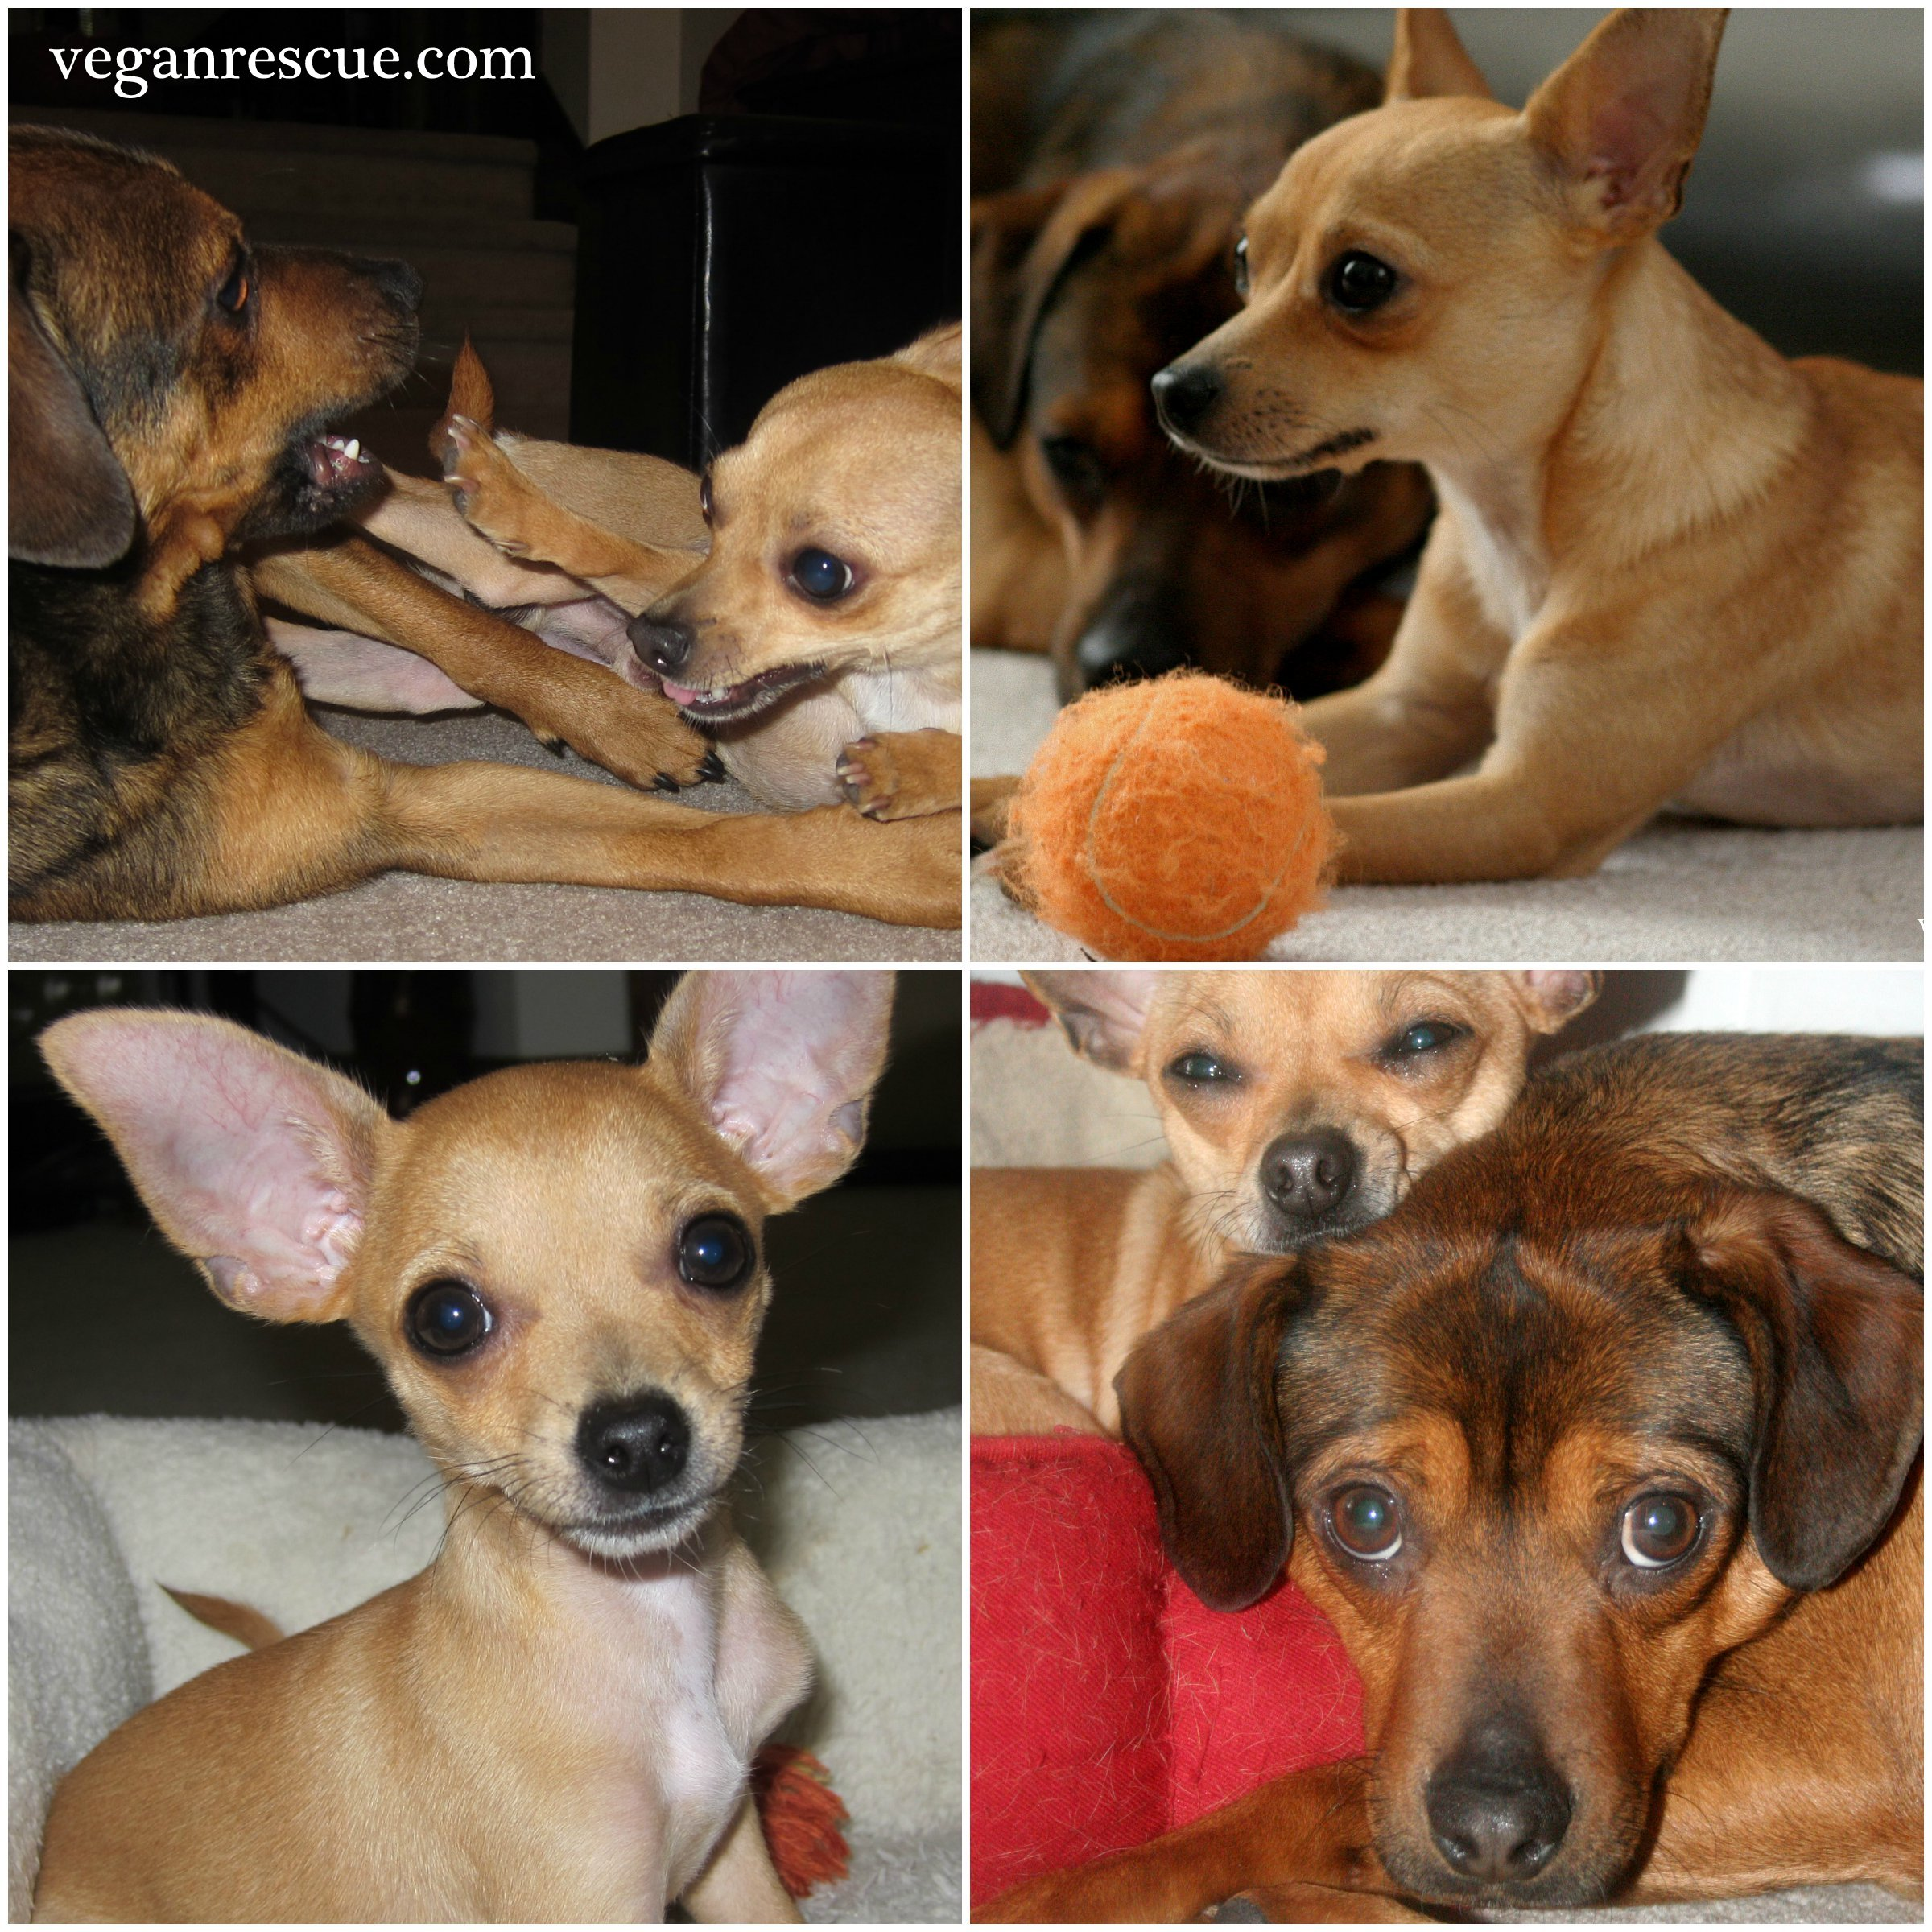 Pleasing Happy Birthday To Beanie Doggie Birthday Cake Vegan Rescue Funny Birthday Cards Online Unhofree Goldxyz